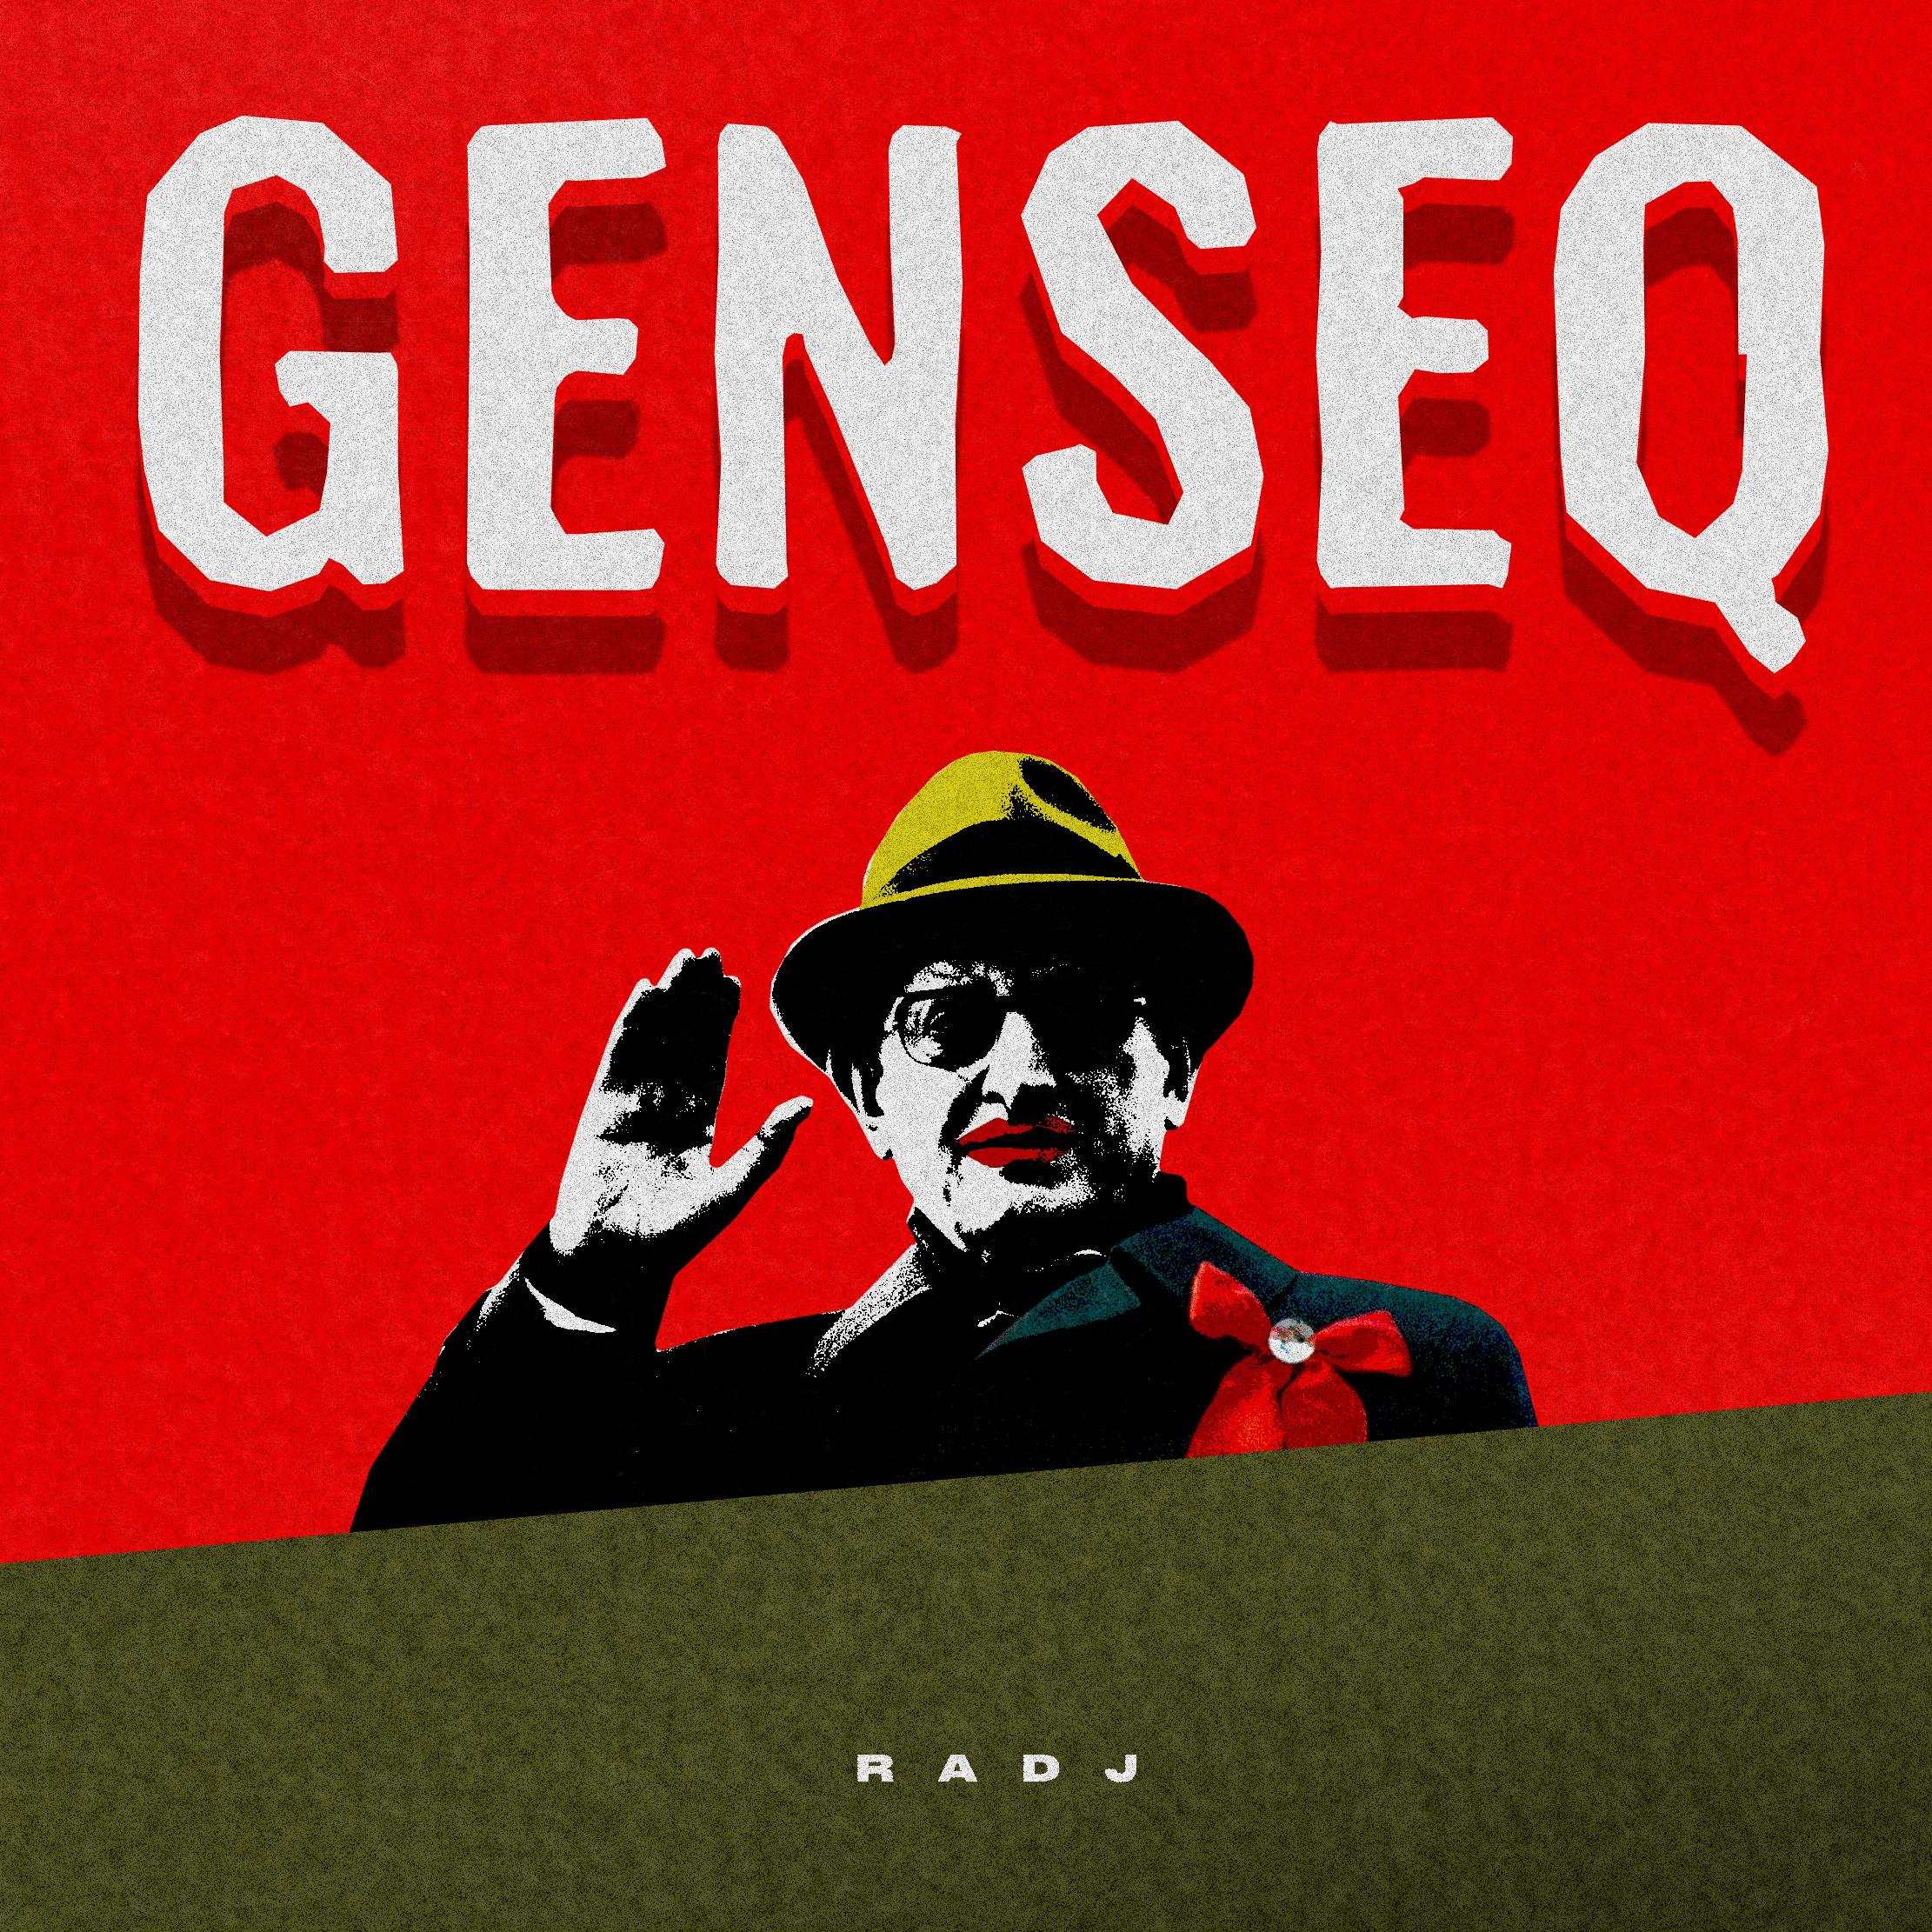 Radj – Genseq